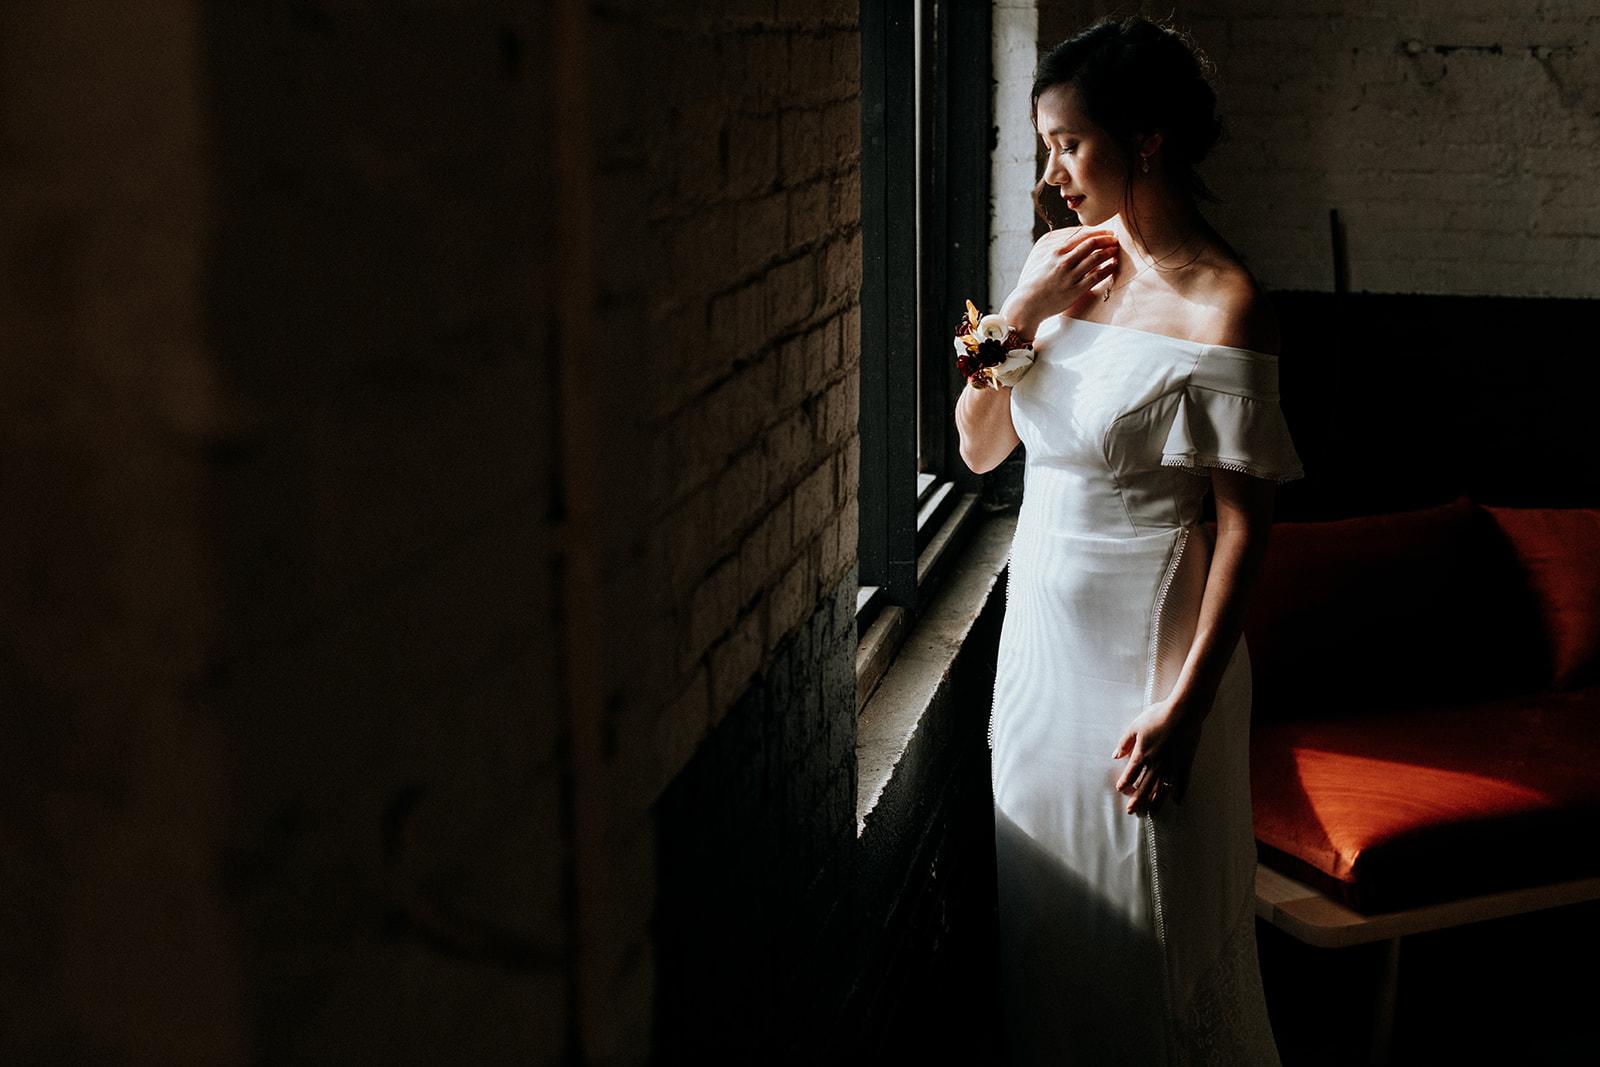 Roundhouse_-_Industrial_Wedding_-_Kim_Jay_Photo-101.jpg